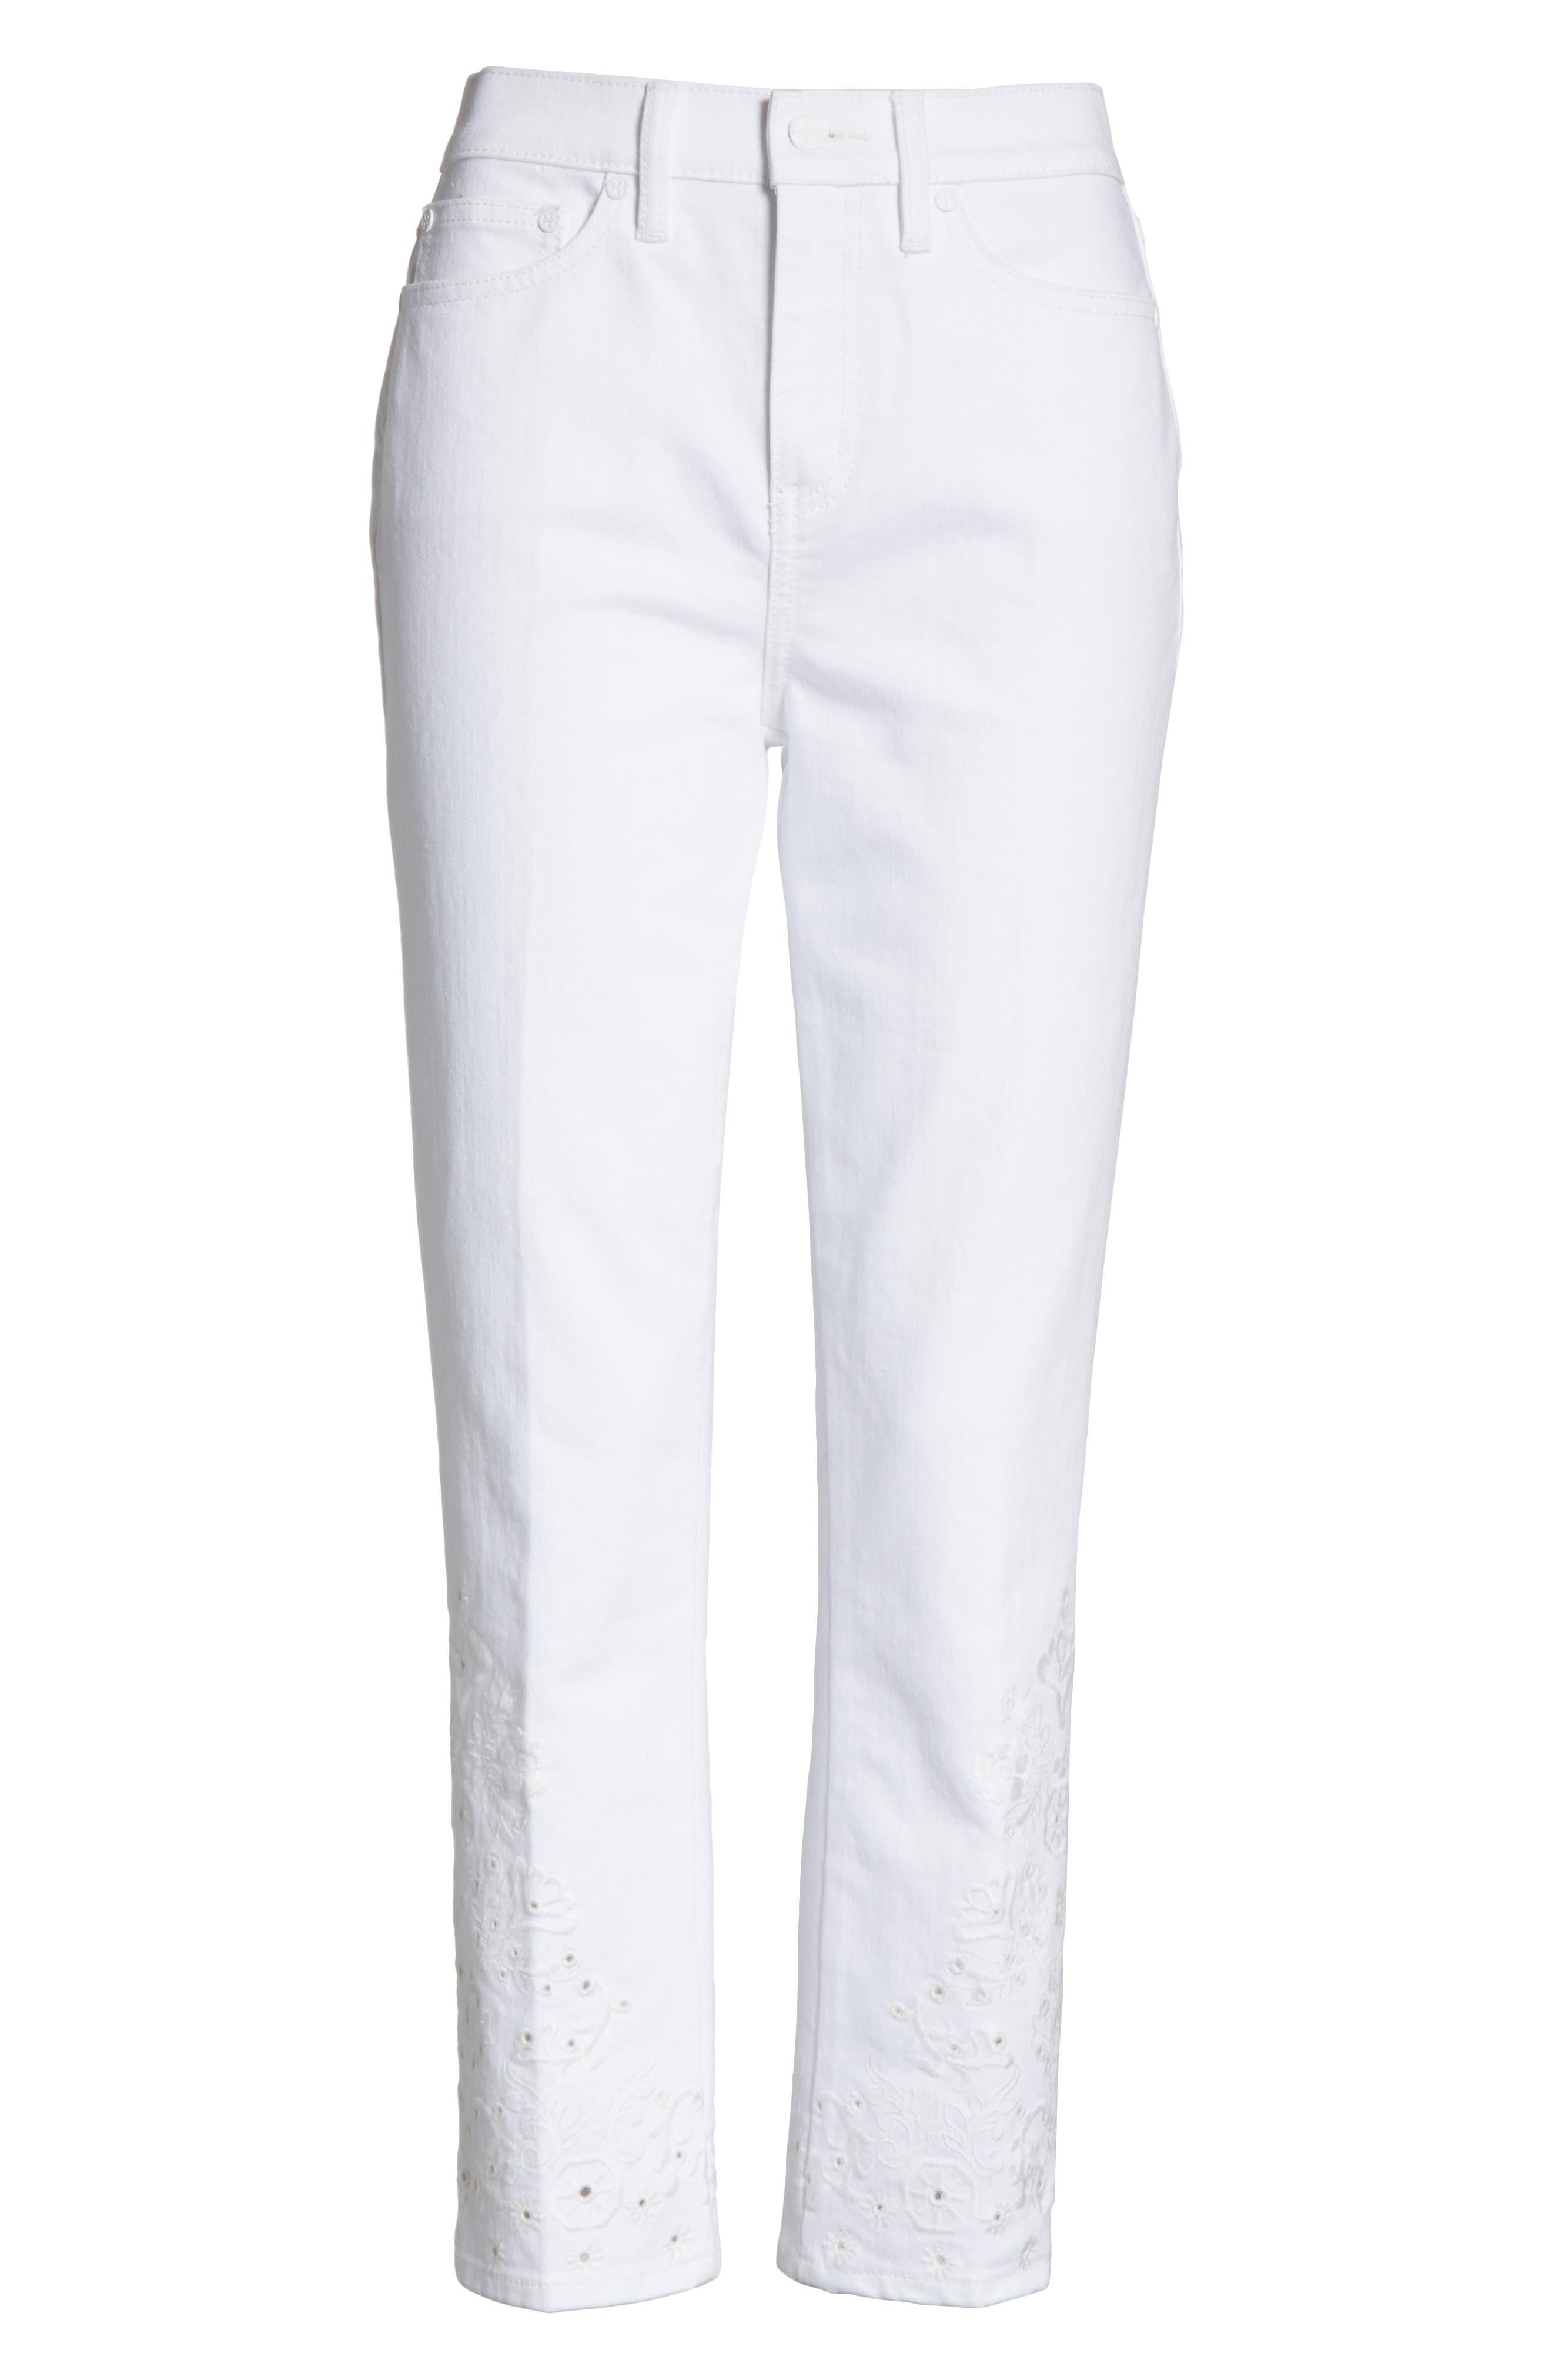 Keira Eyelet Hem Crop Jeans,                             Alternate thumbnail 6, color,                             100